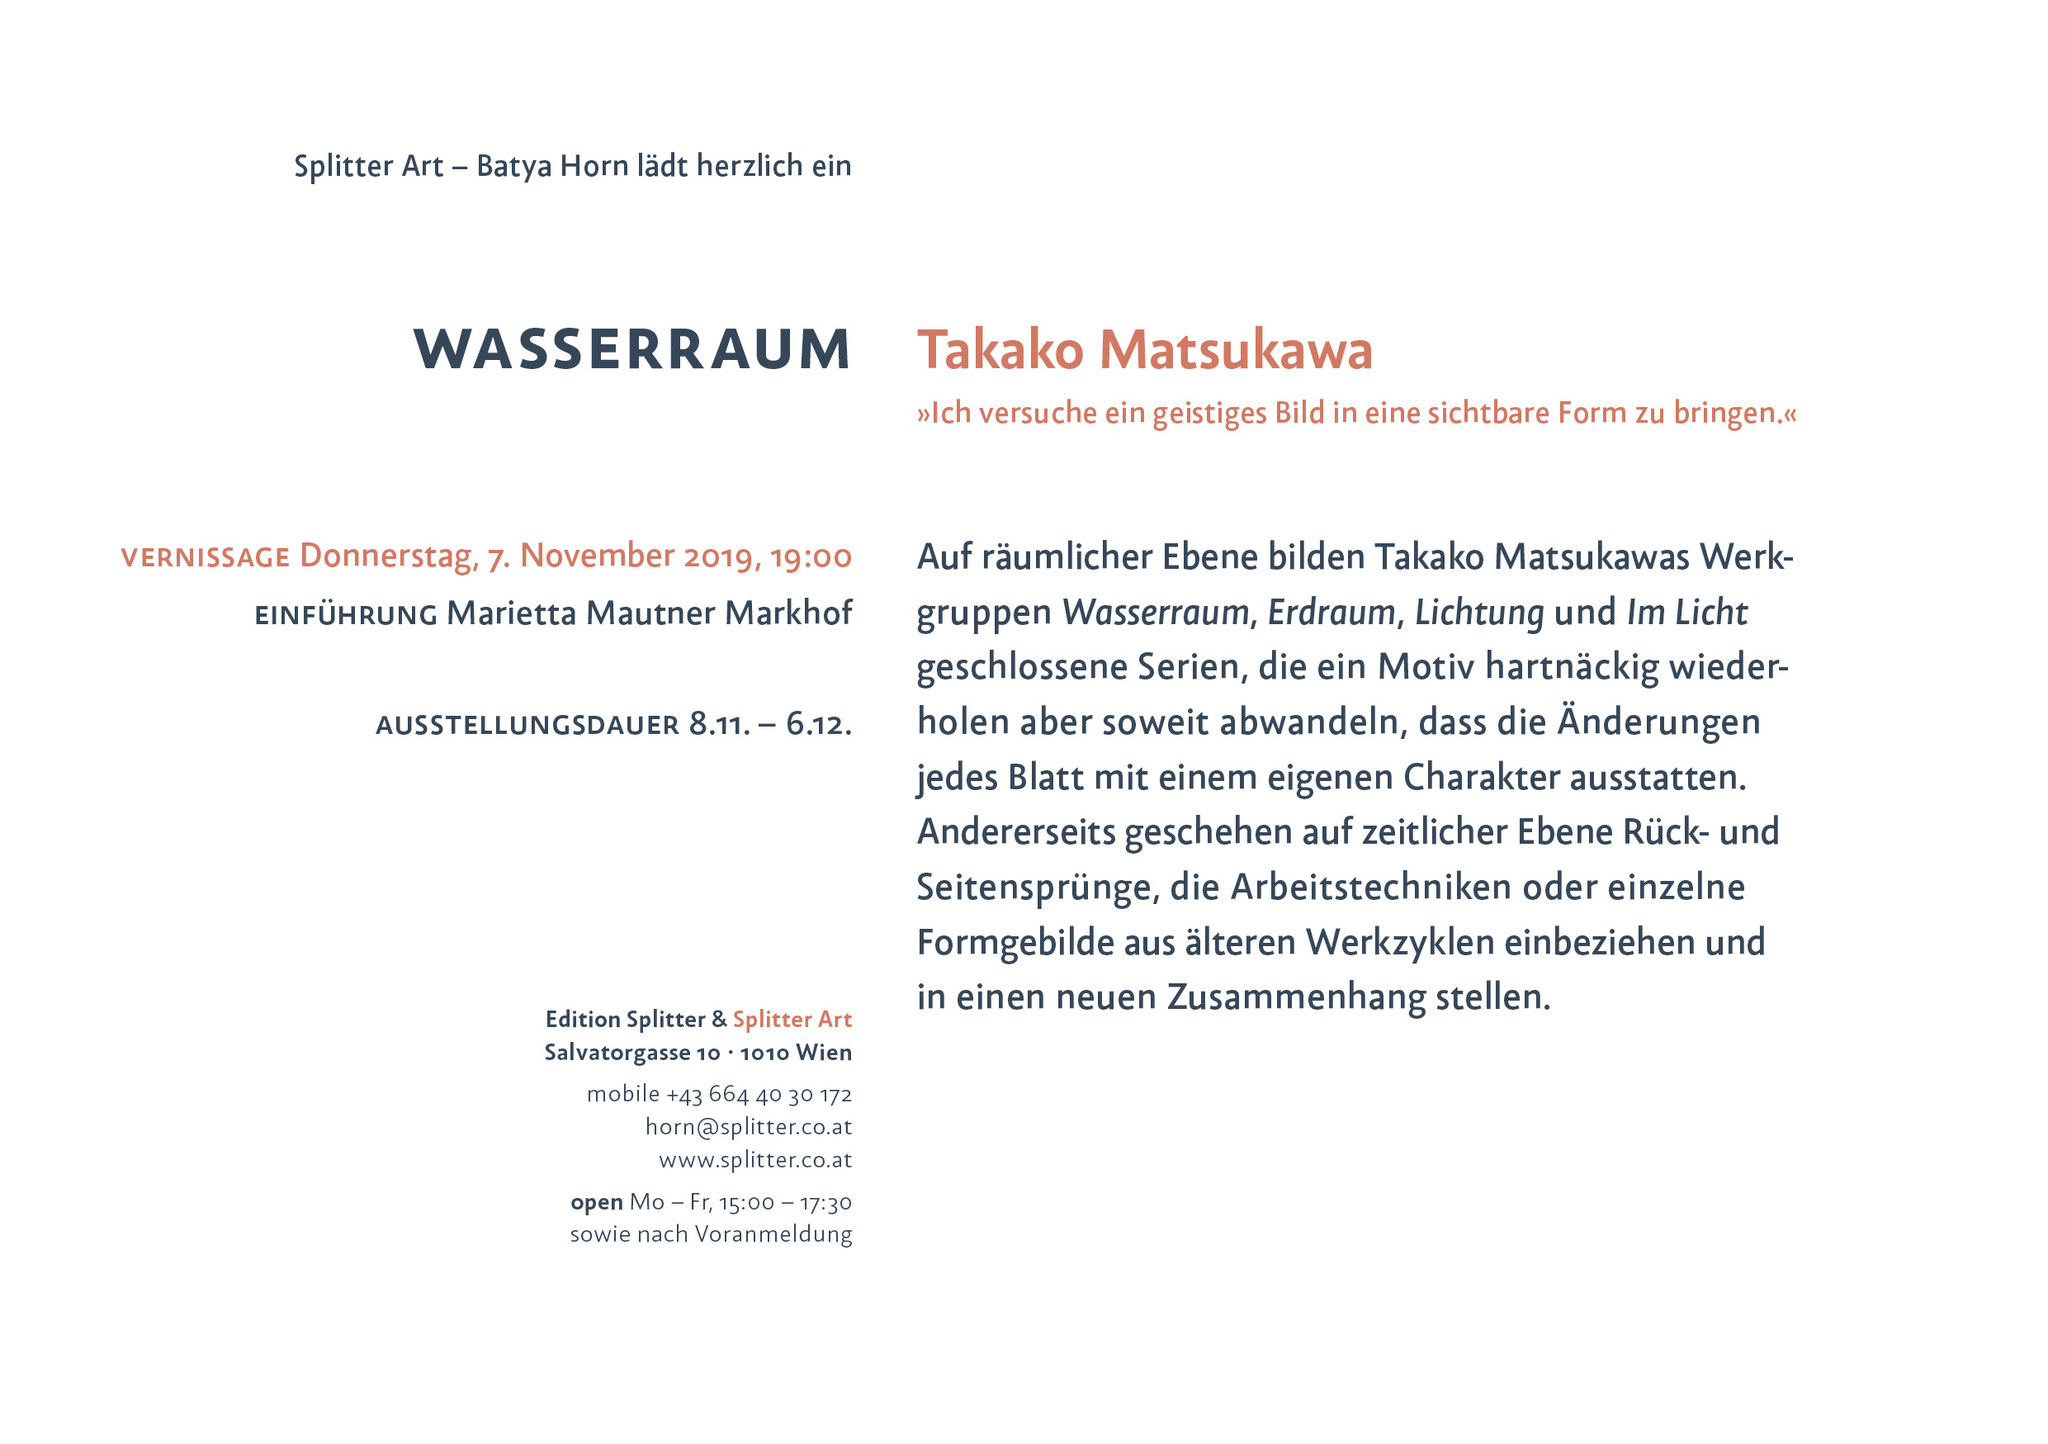 Takako Matsukawa – WASSERRAUM